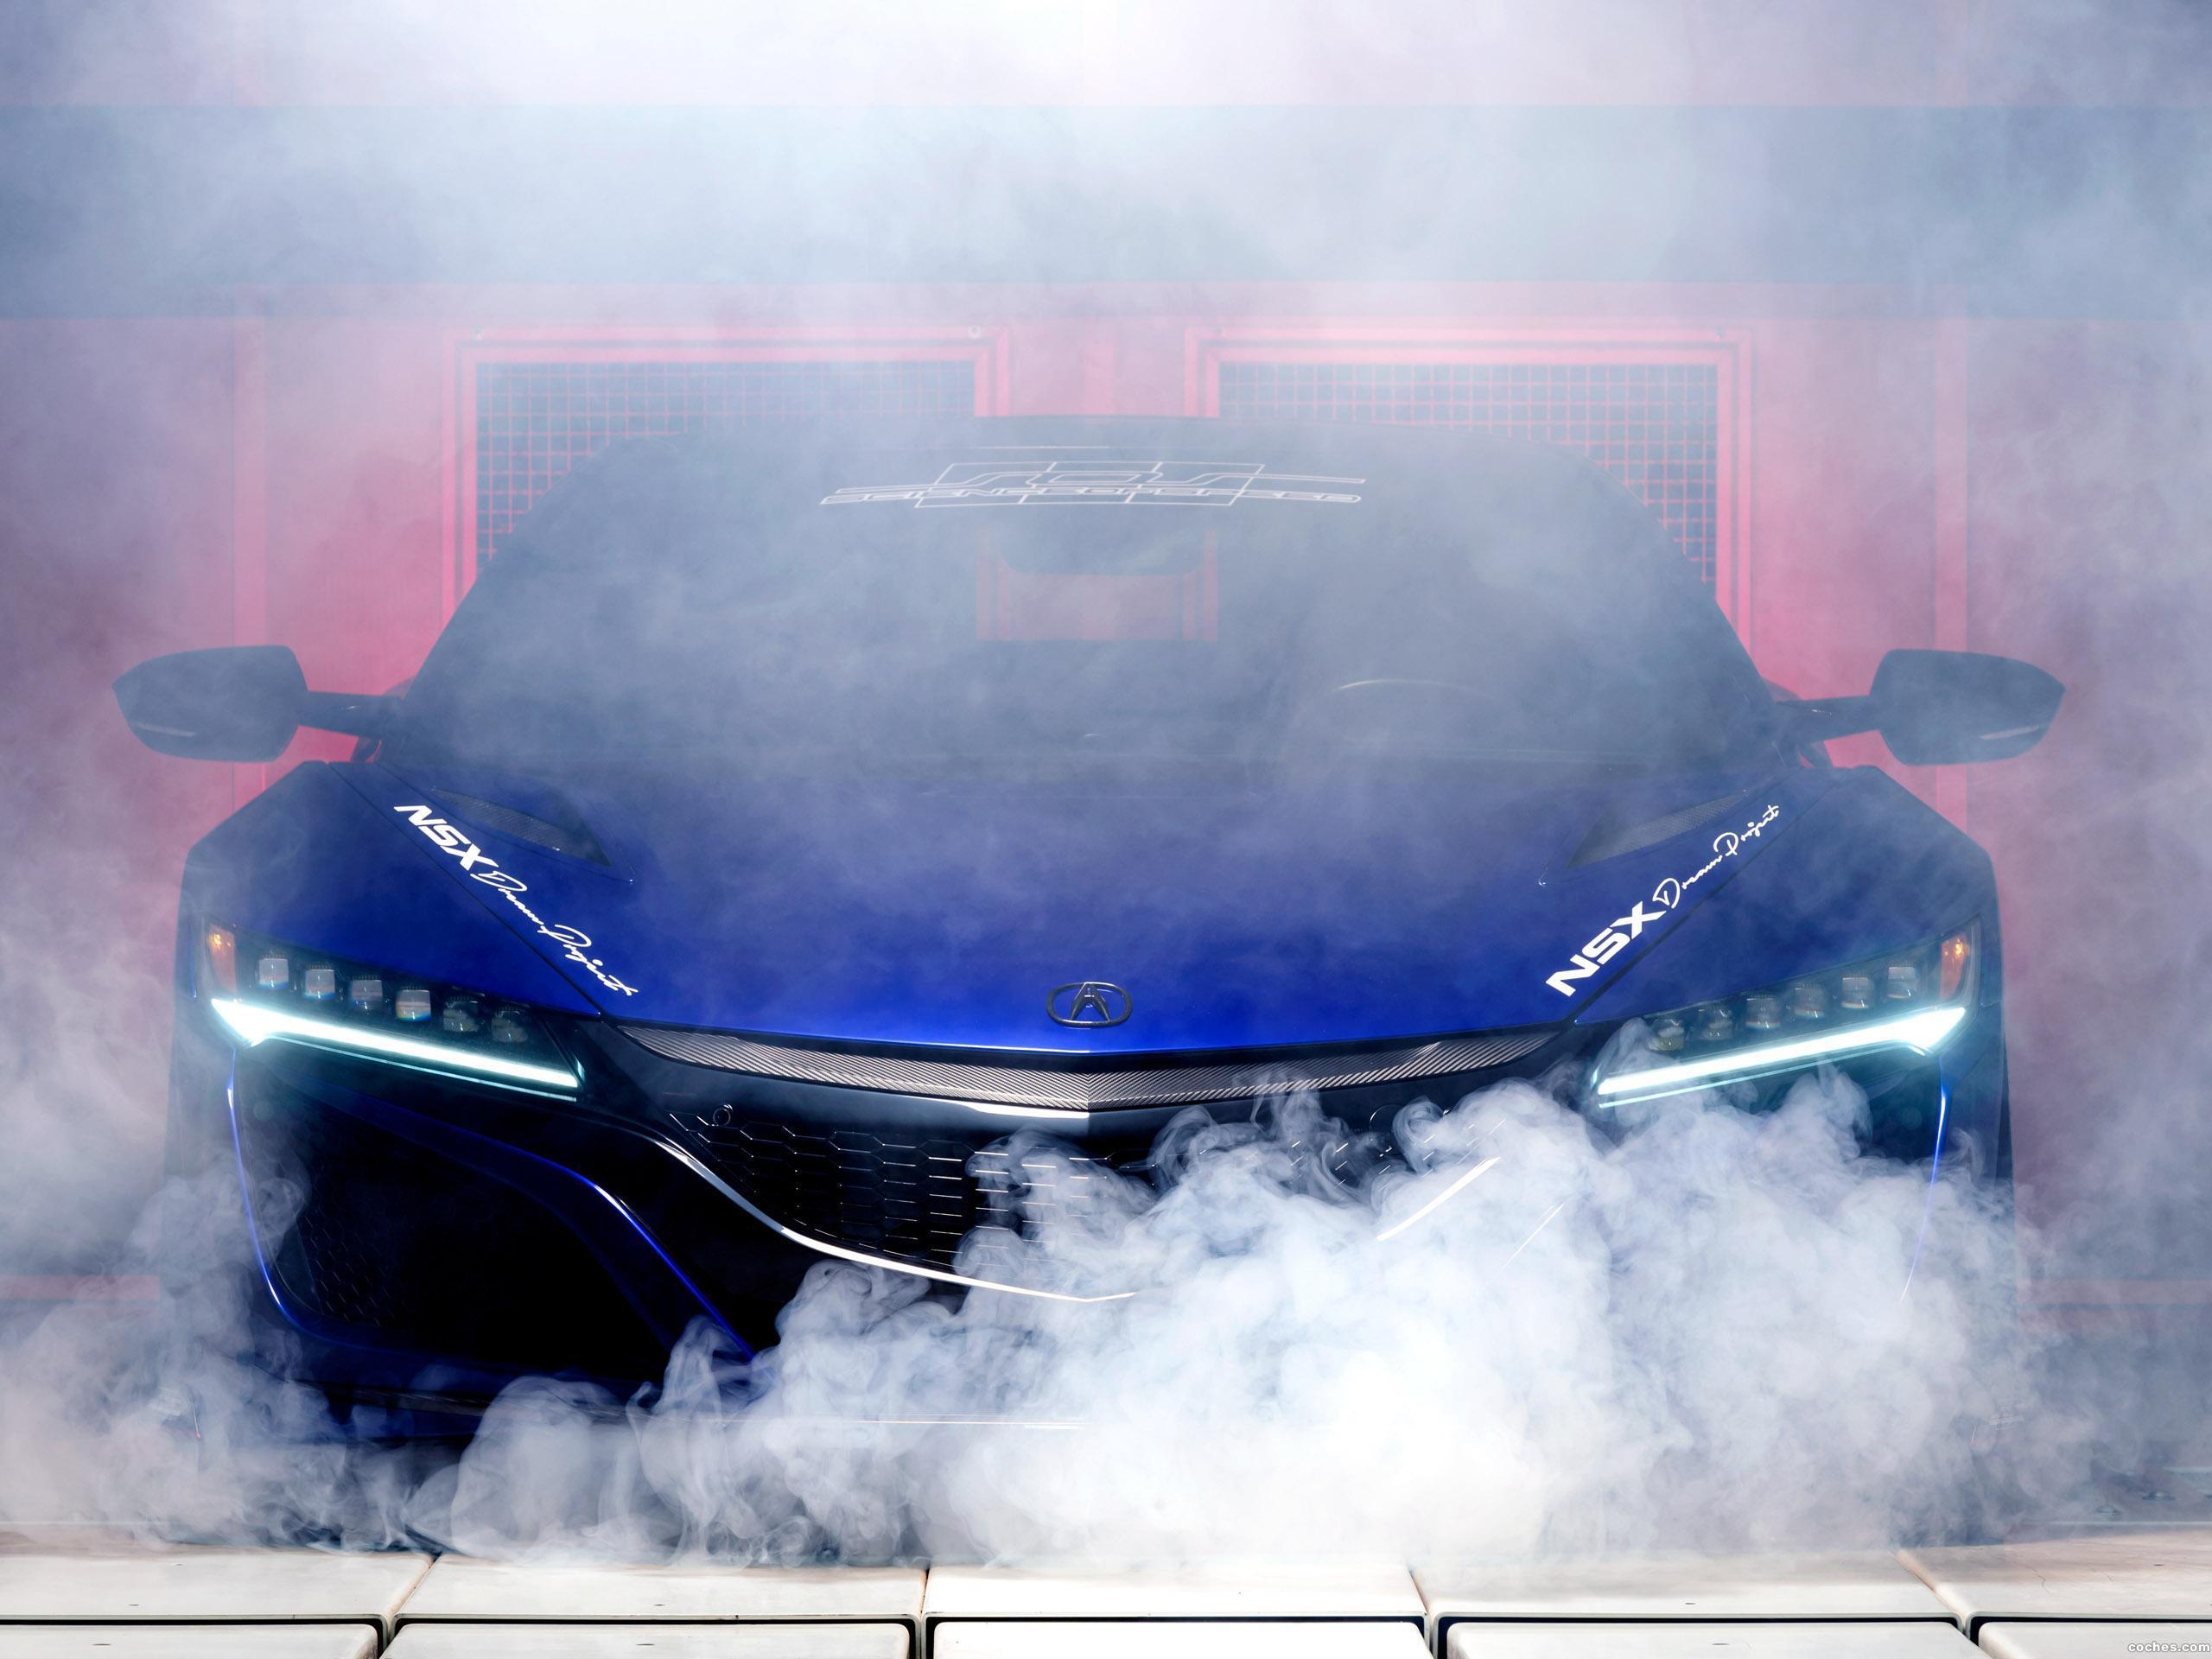 Foto 2 de Acura NSX Dream Project Scienceofspeed 2017